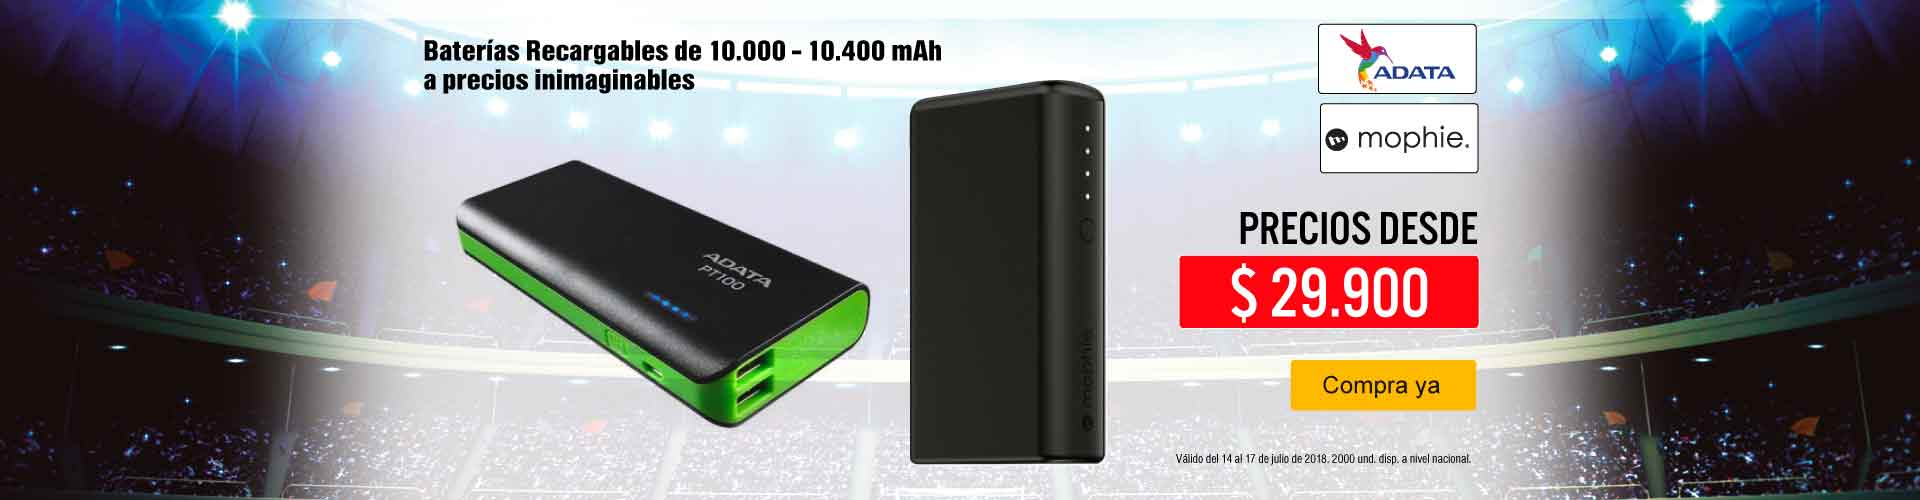 KT-PPAL-7-Accesorios-PP-baterias-recargables-jul14